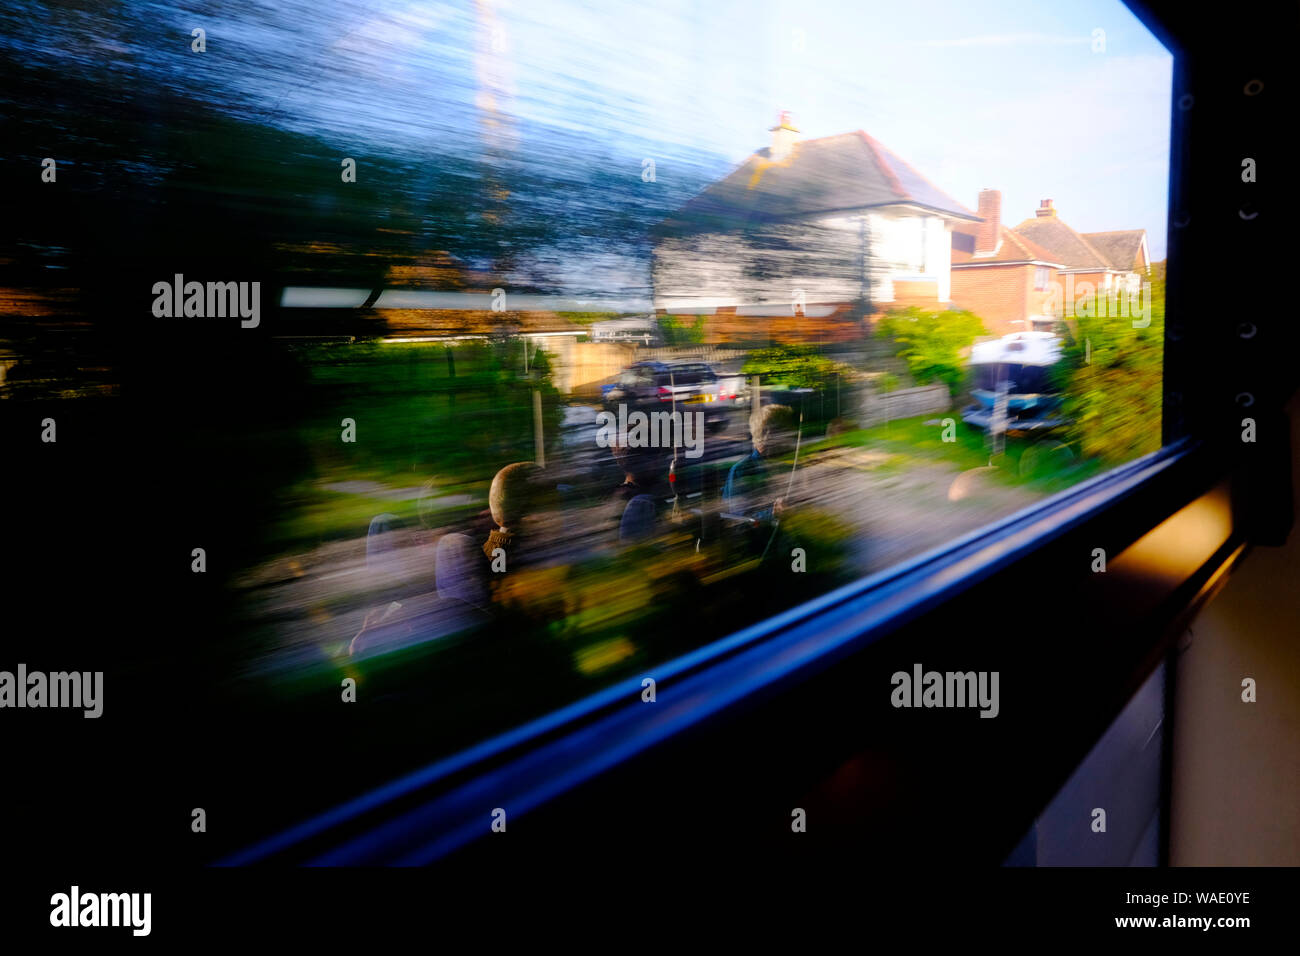 Bus travel movement passenger window reflections Stock Photo